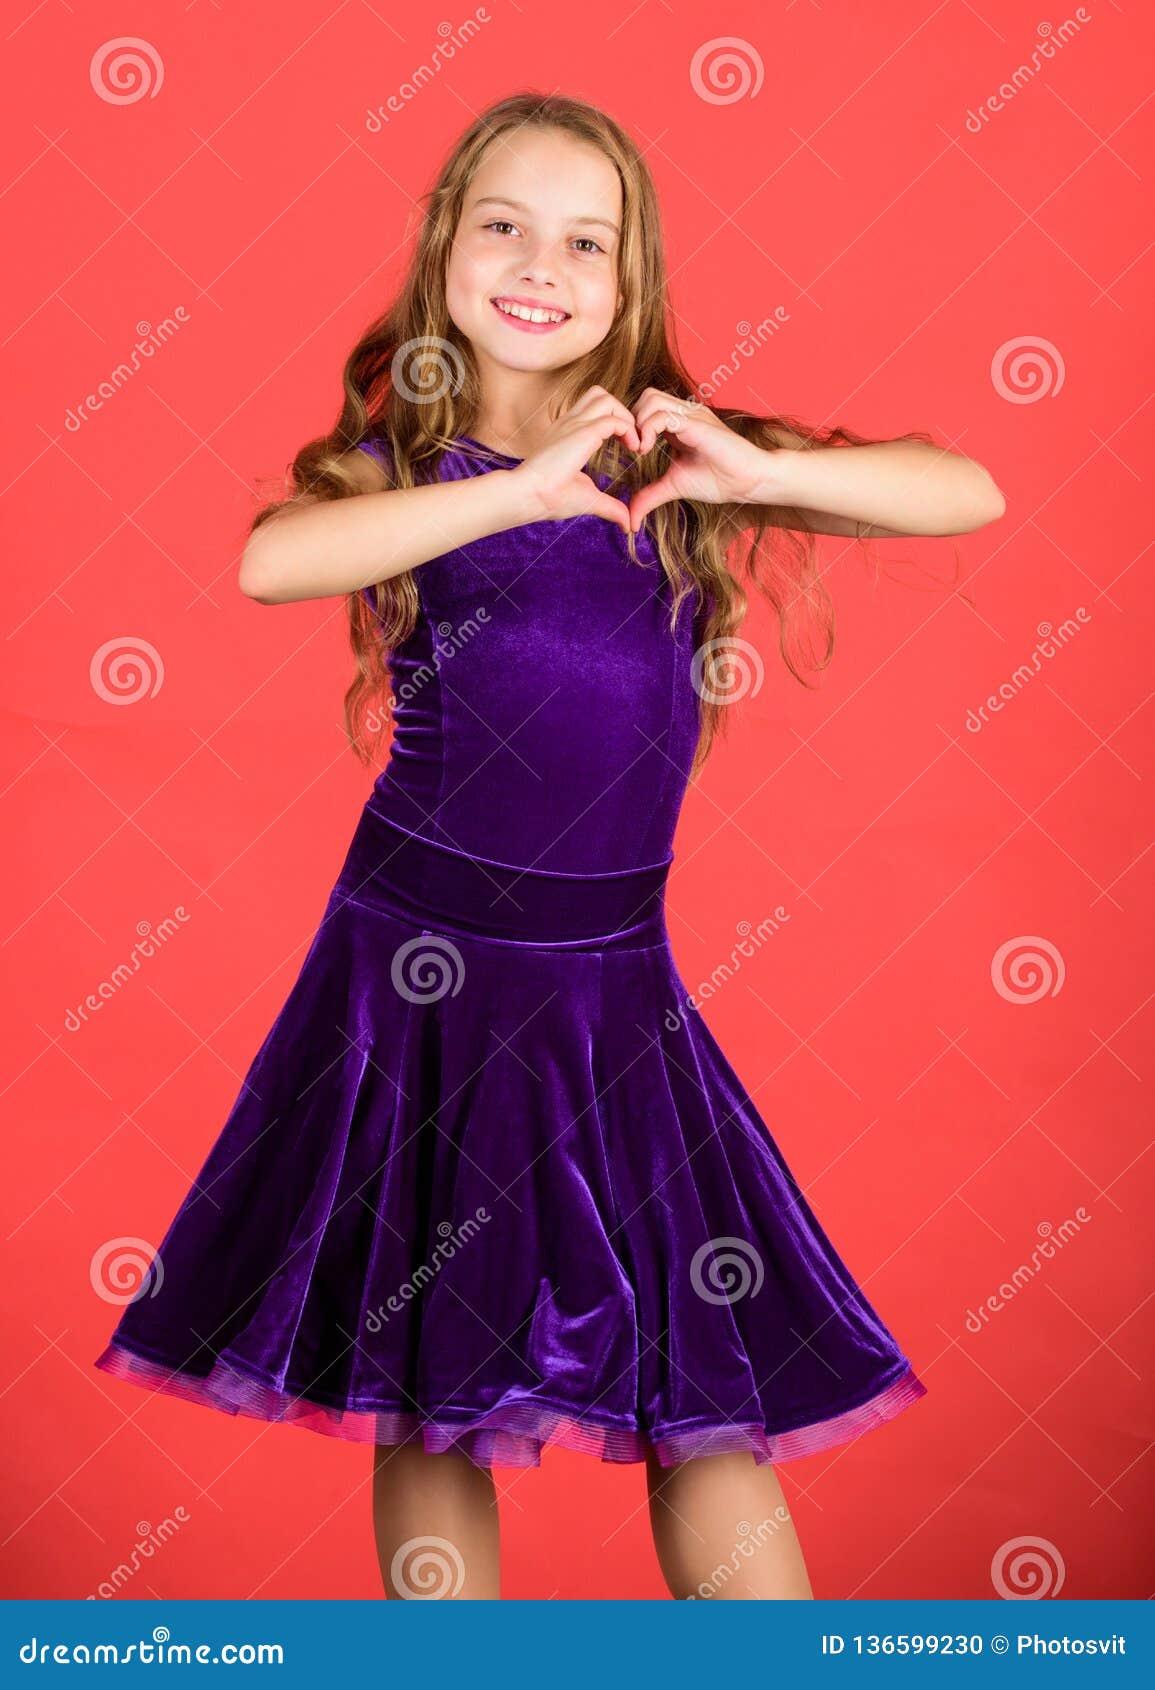 76b07a1761fb Love Concept. Girl Cute Child Show Heart Shaped Hand Gesture. Love ...